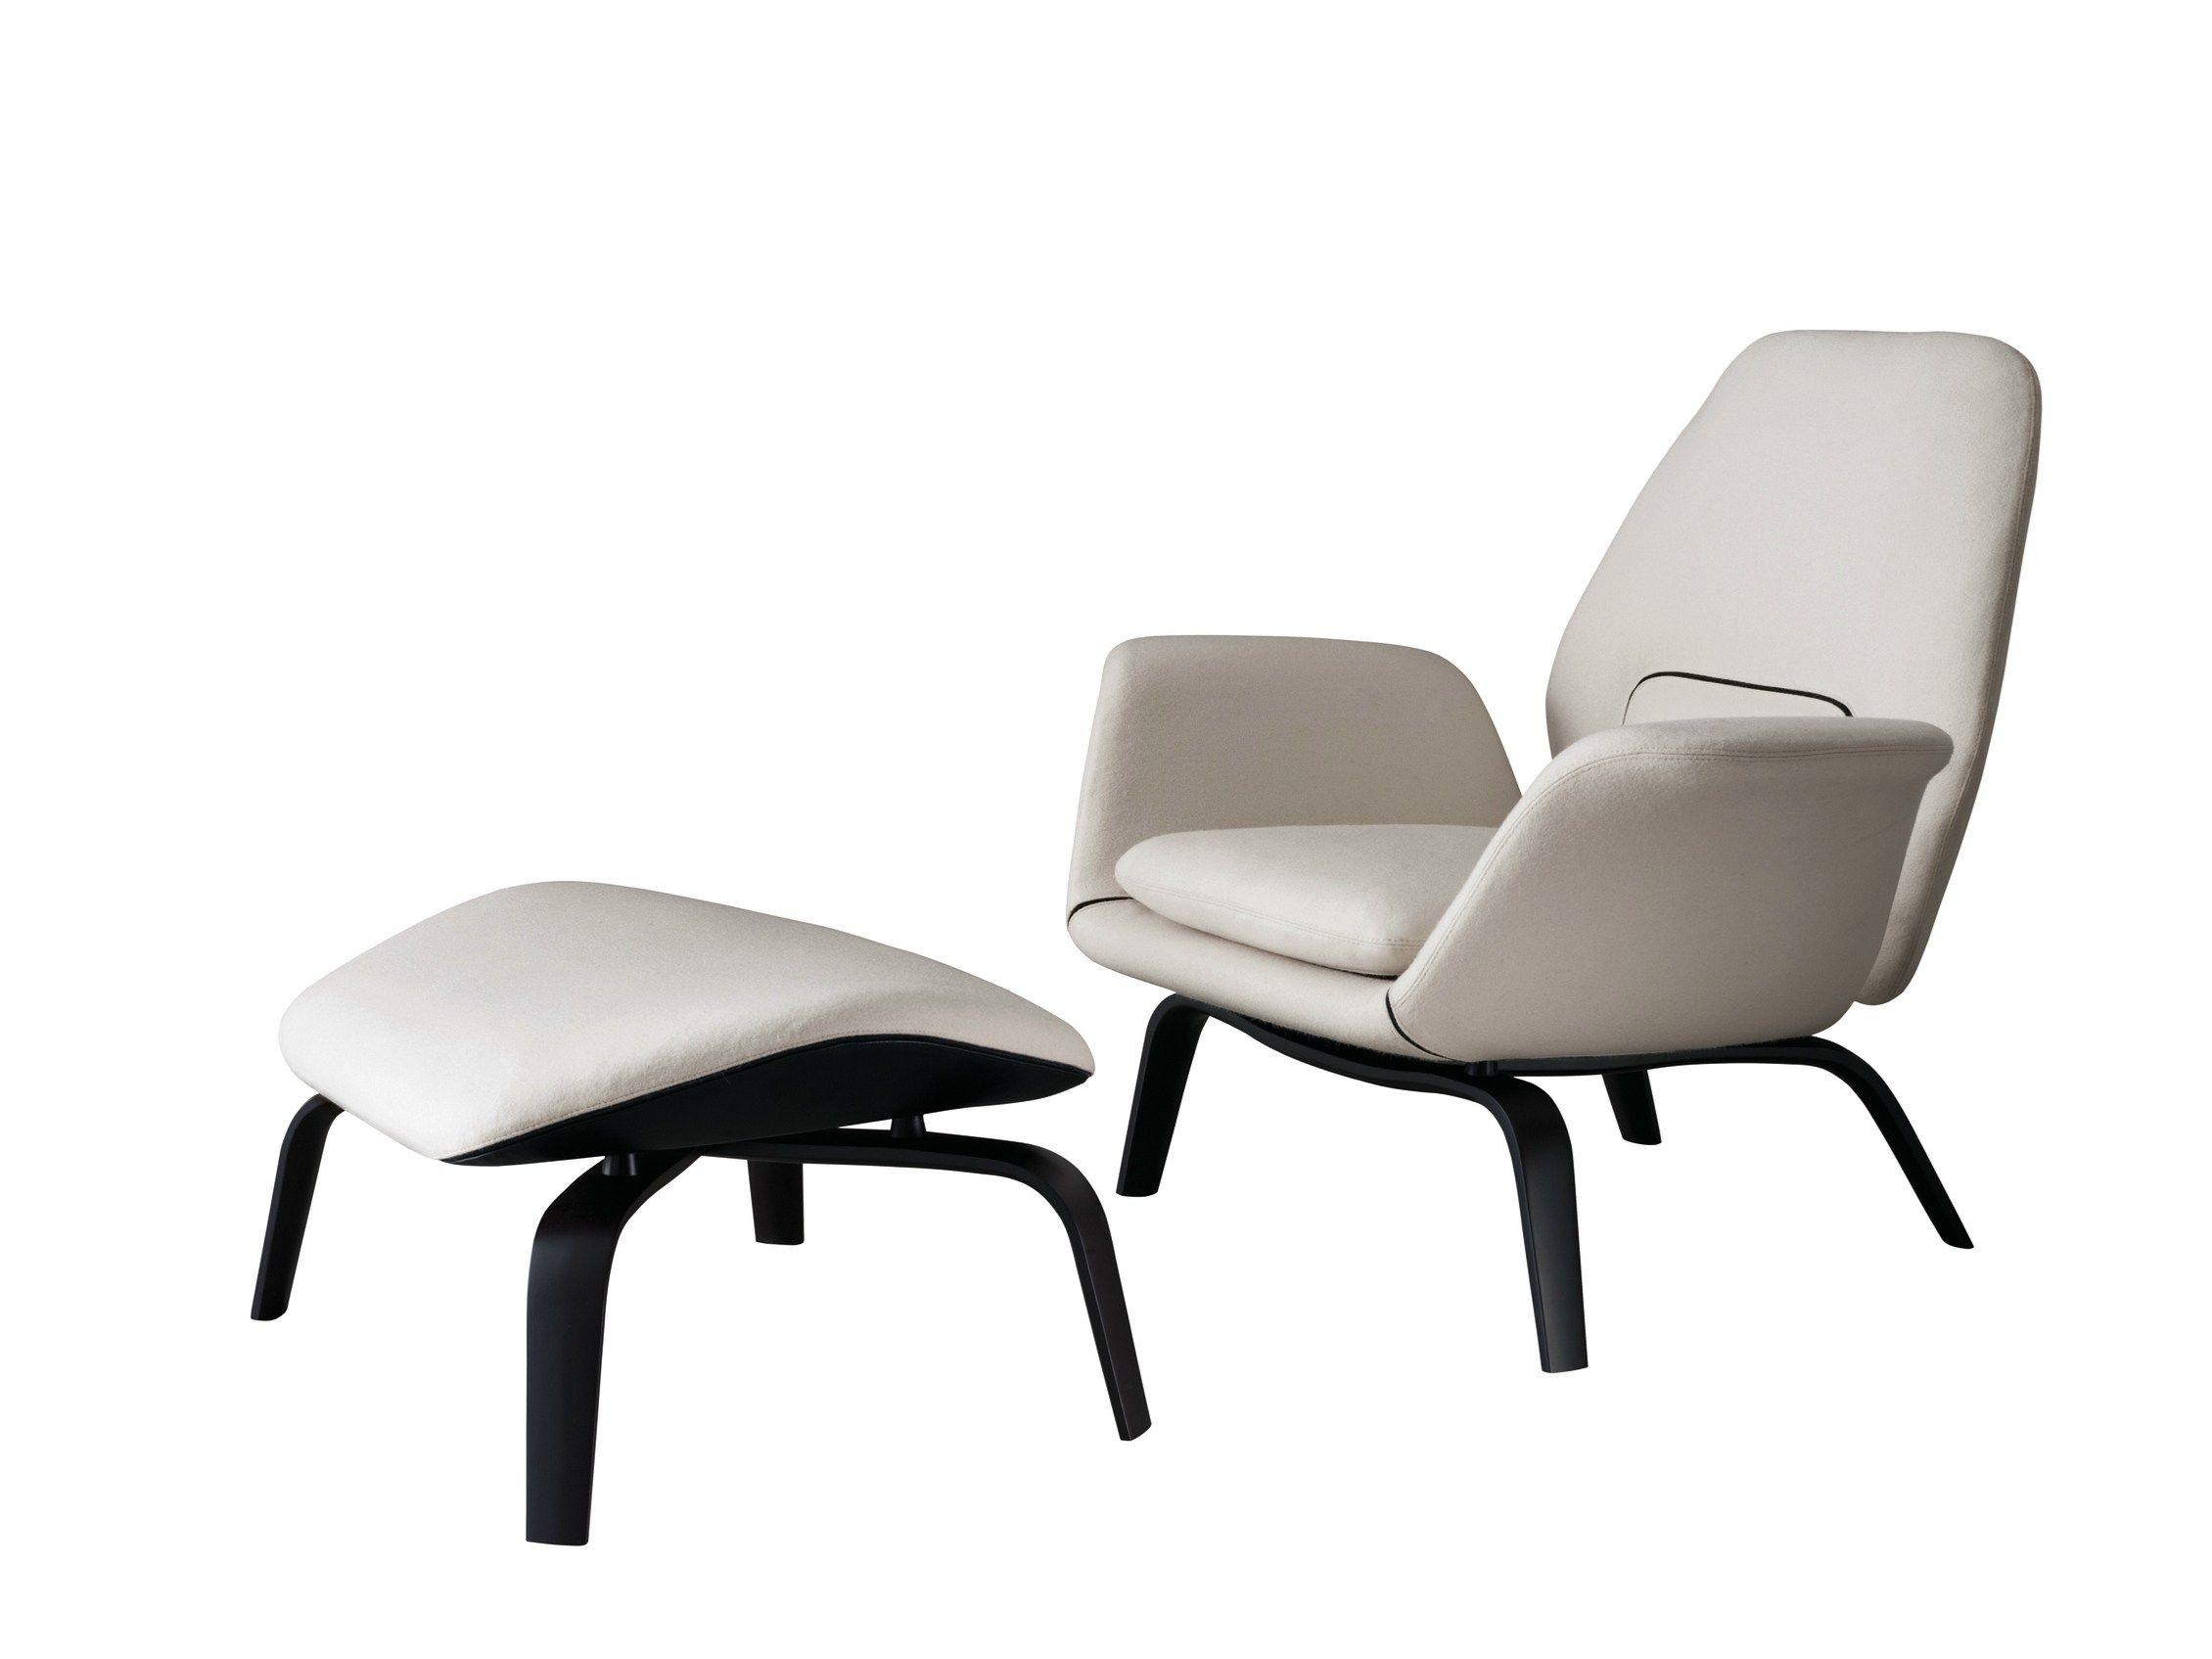 minotti sofas australia palochina sofa bed foot stool google search chair 沙发椅